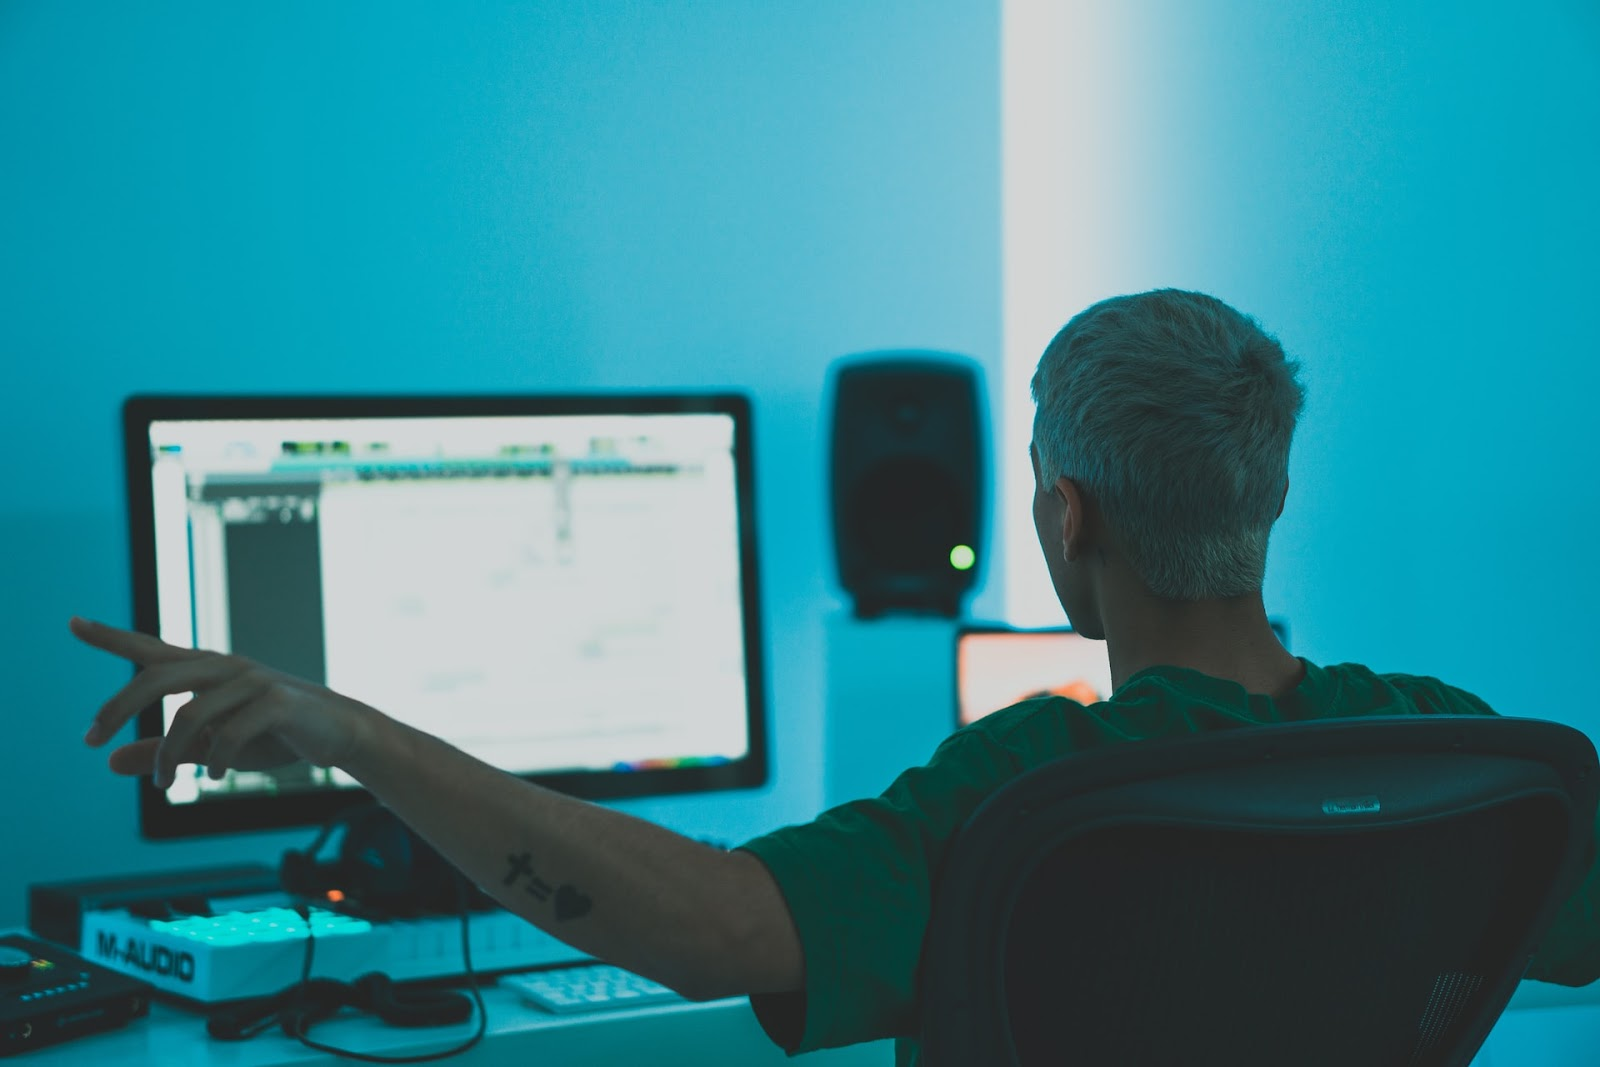 Produtor masterizando música